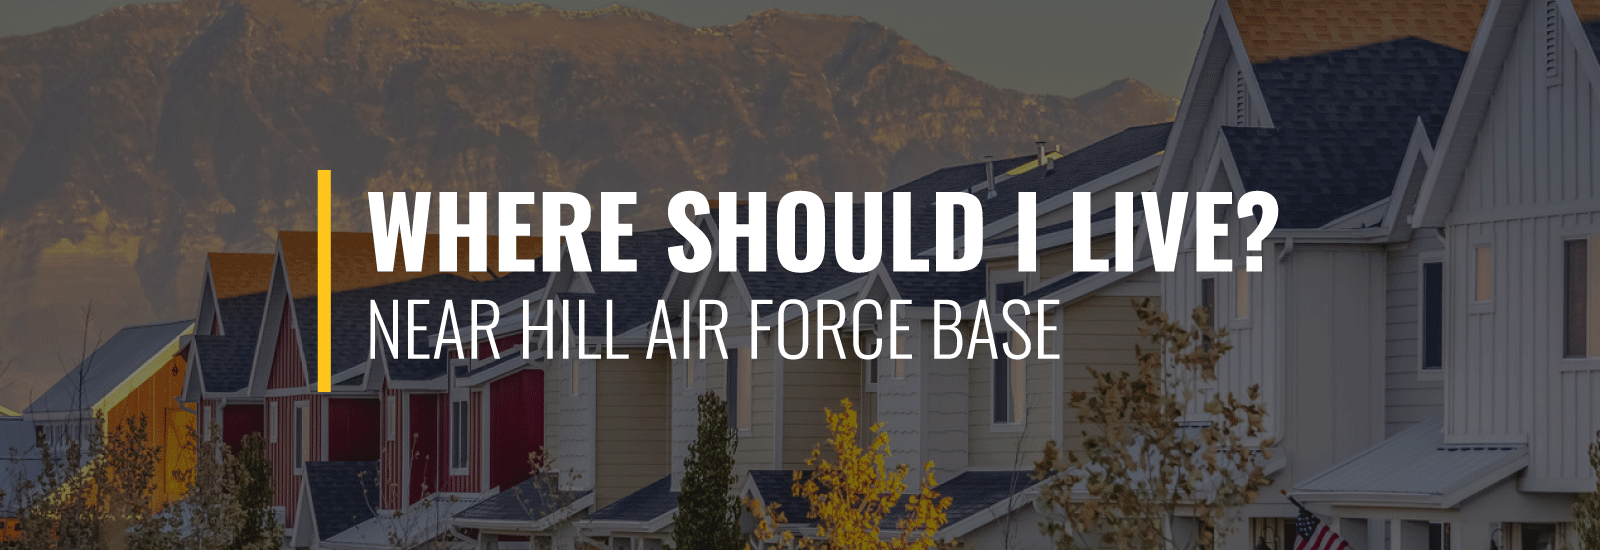 Where Should I Live Near Hill Air Force Base?